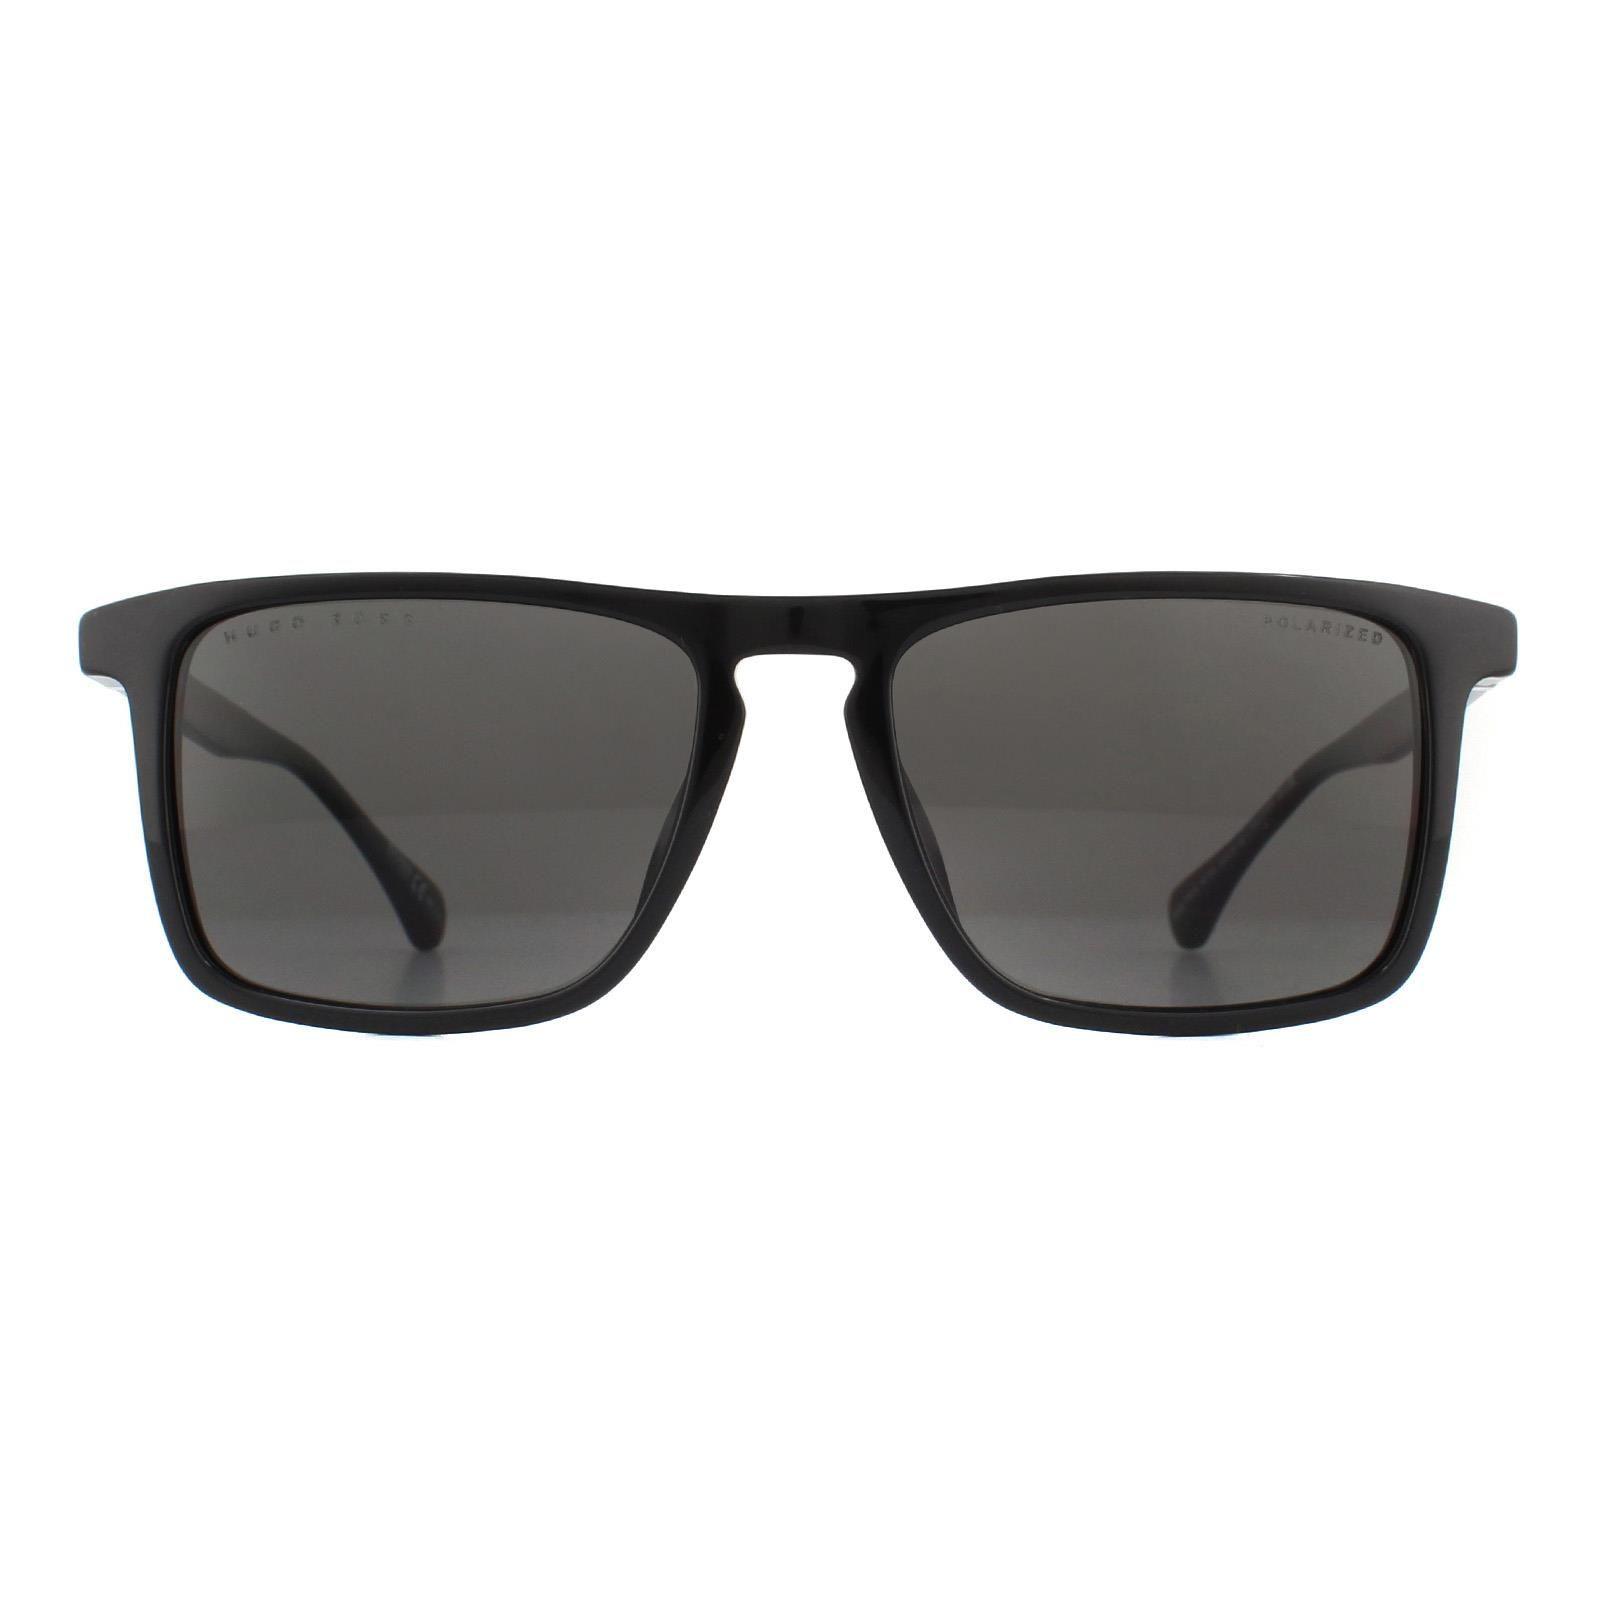 Hugo Boss Sunglasses 1082/S 807 M9 Black Grey Polarized